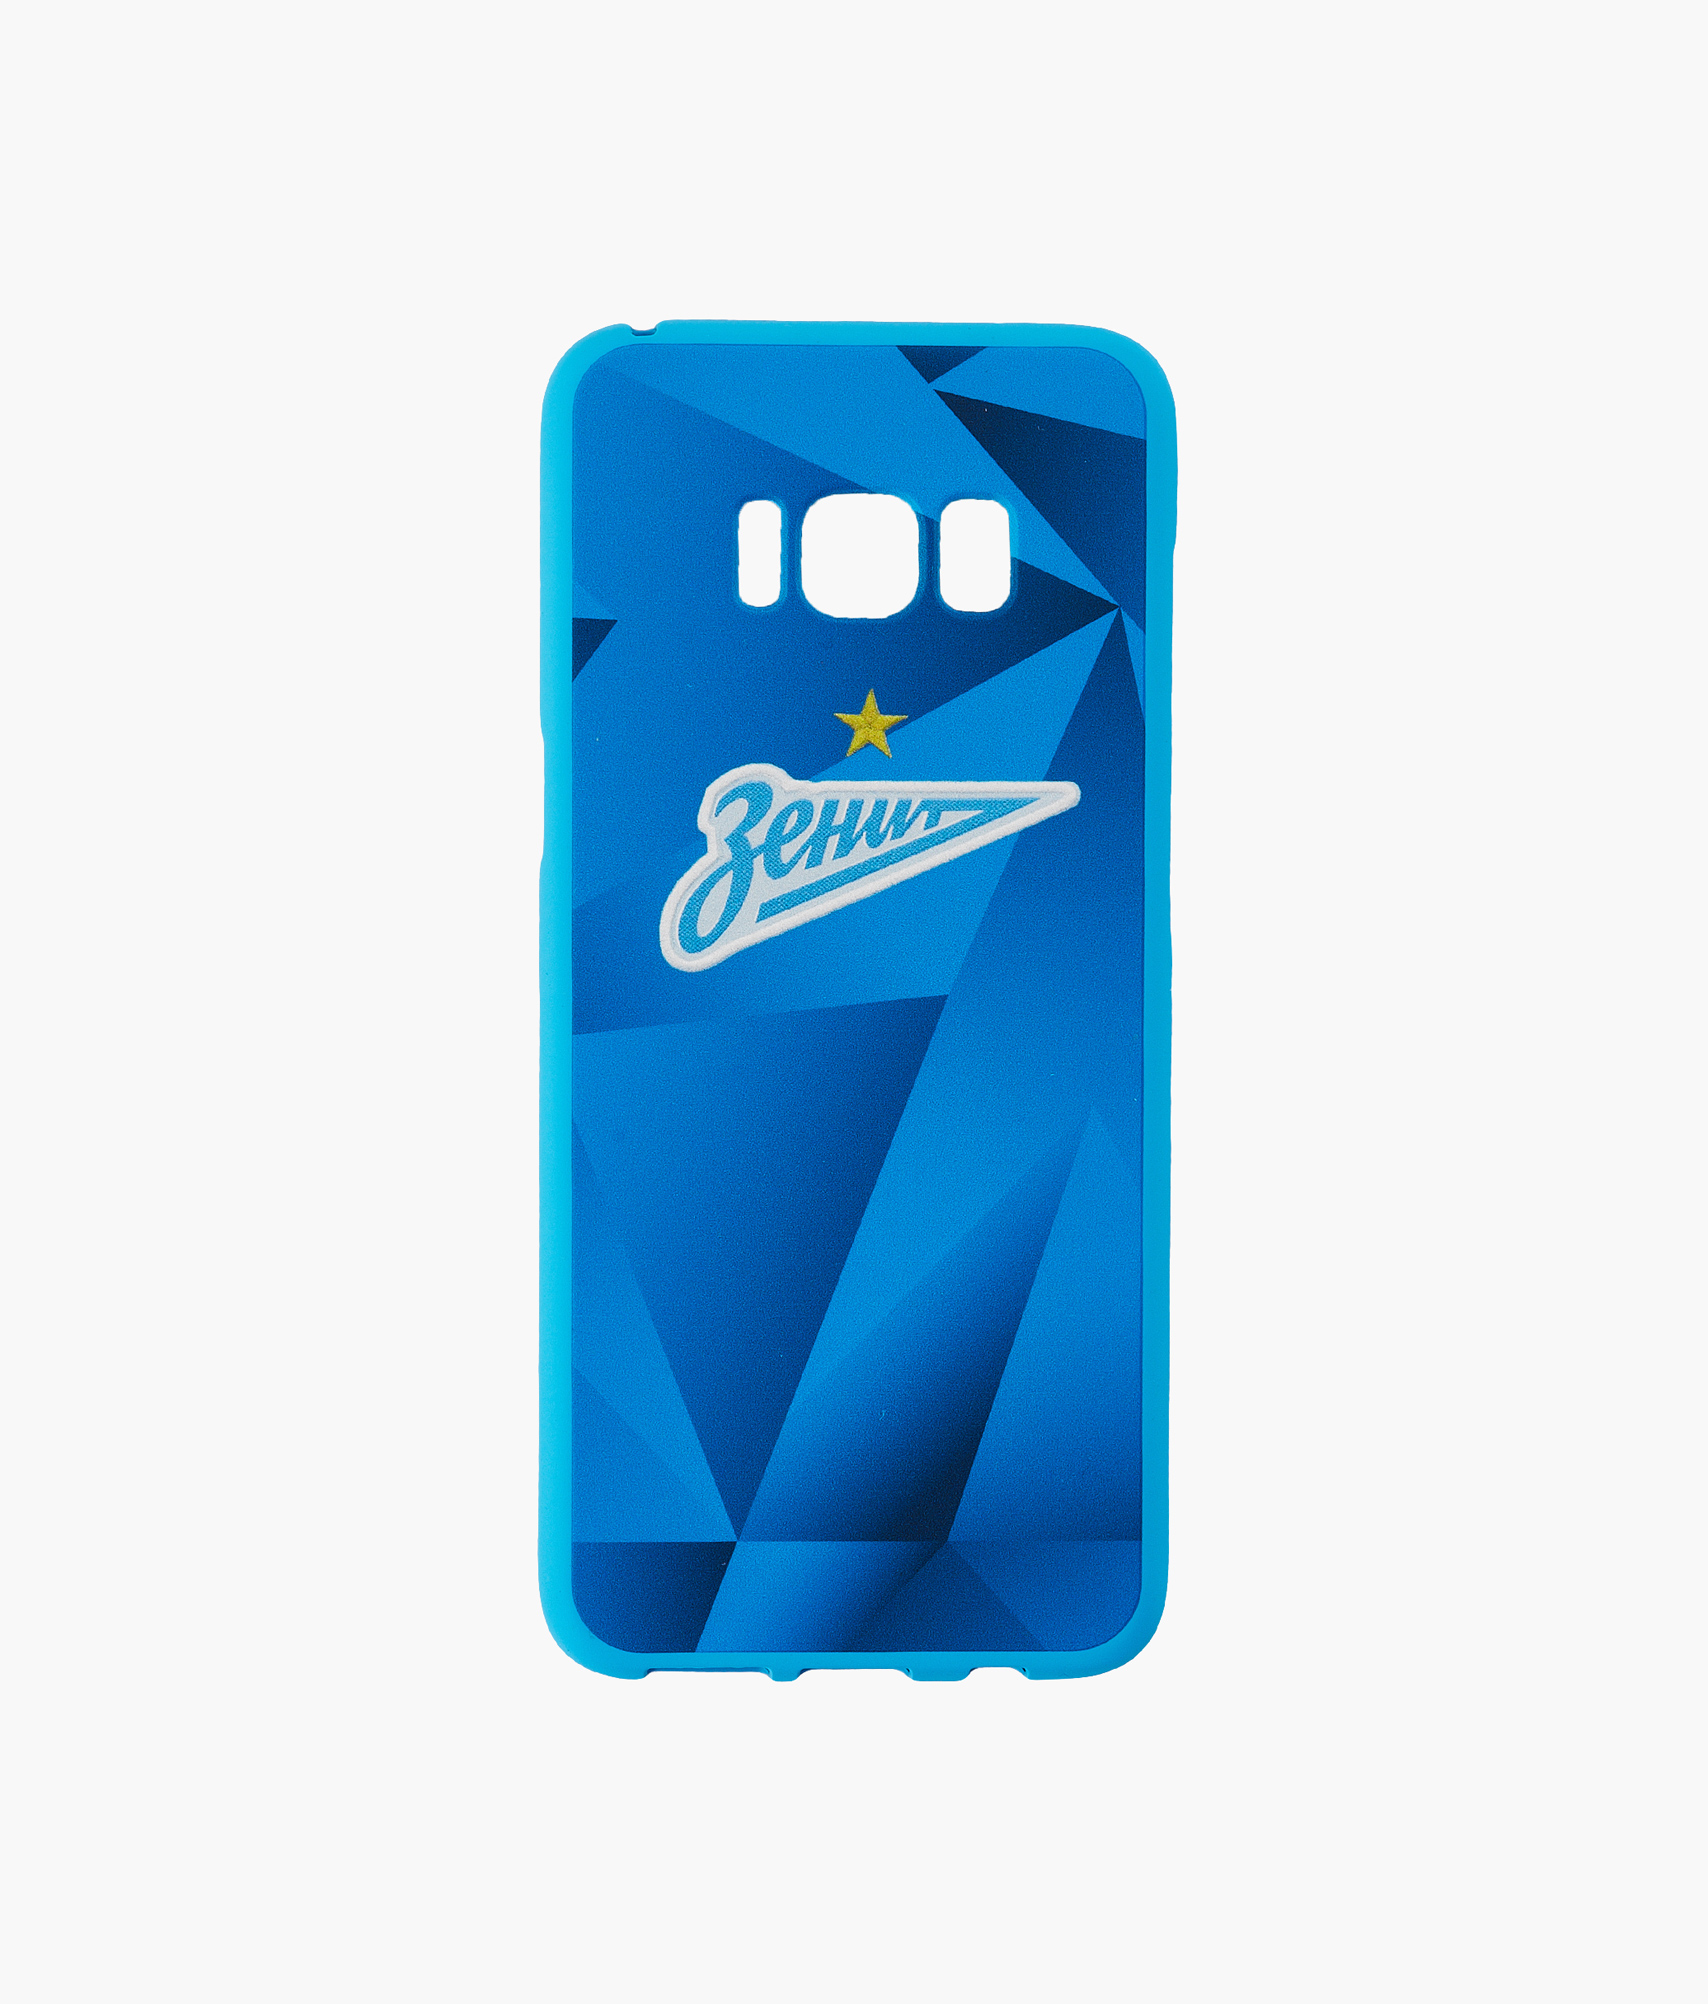 Фото - Чехол для Samsung Galaxy S8 «Форма 2019/20» Зенит Цвет-Синий чехол